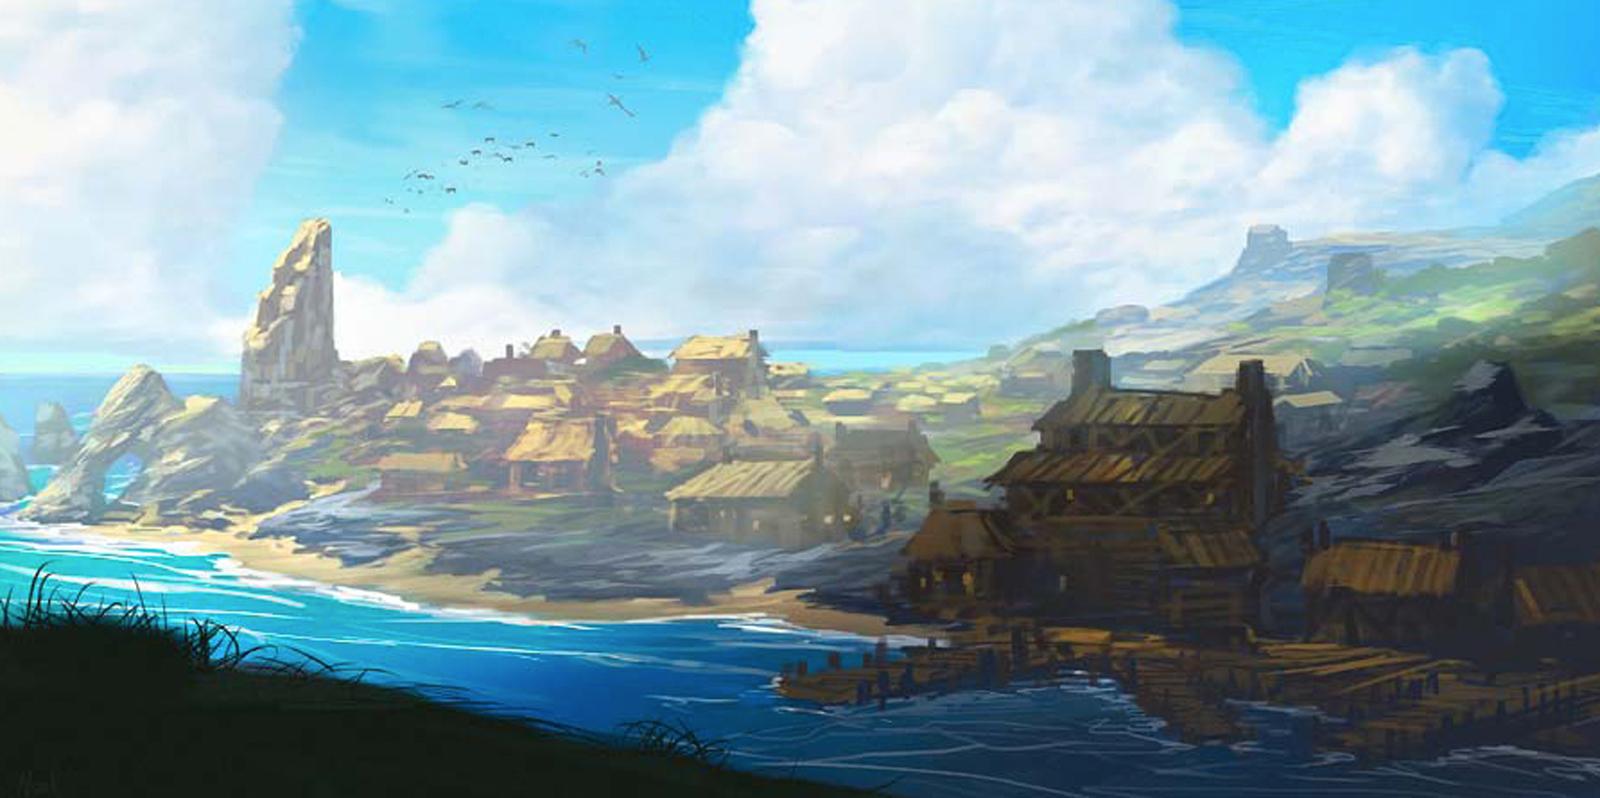 Sandpoint cityscape